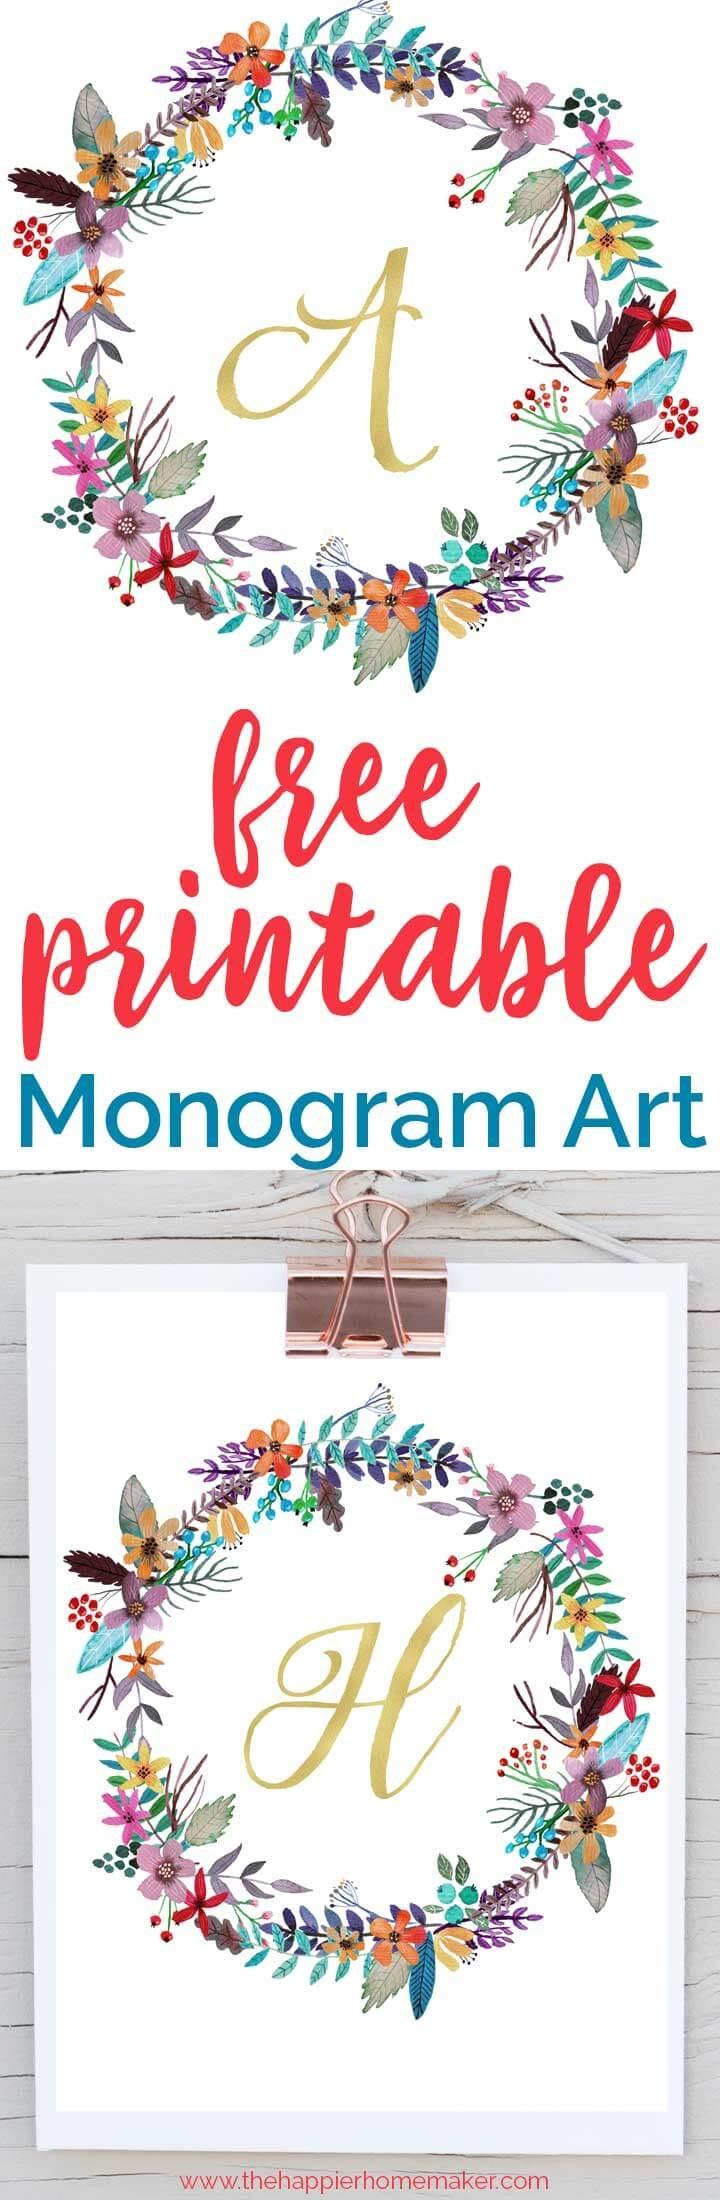 Free Printable Monogram Art | The Happier Homemaker - Free Printable Monogram